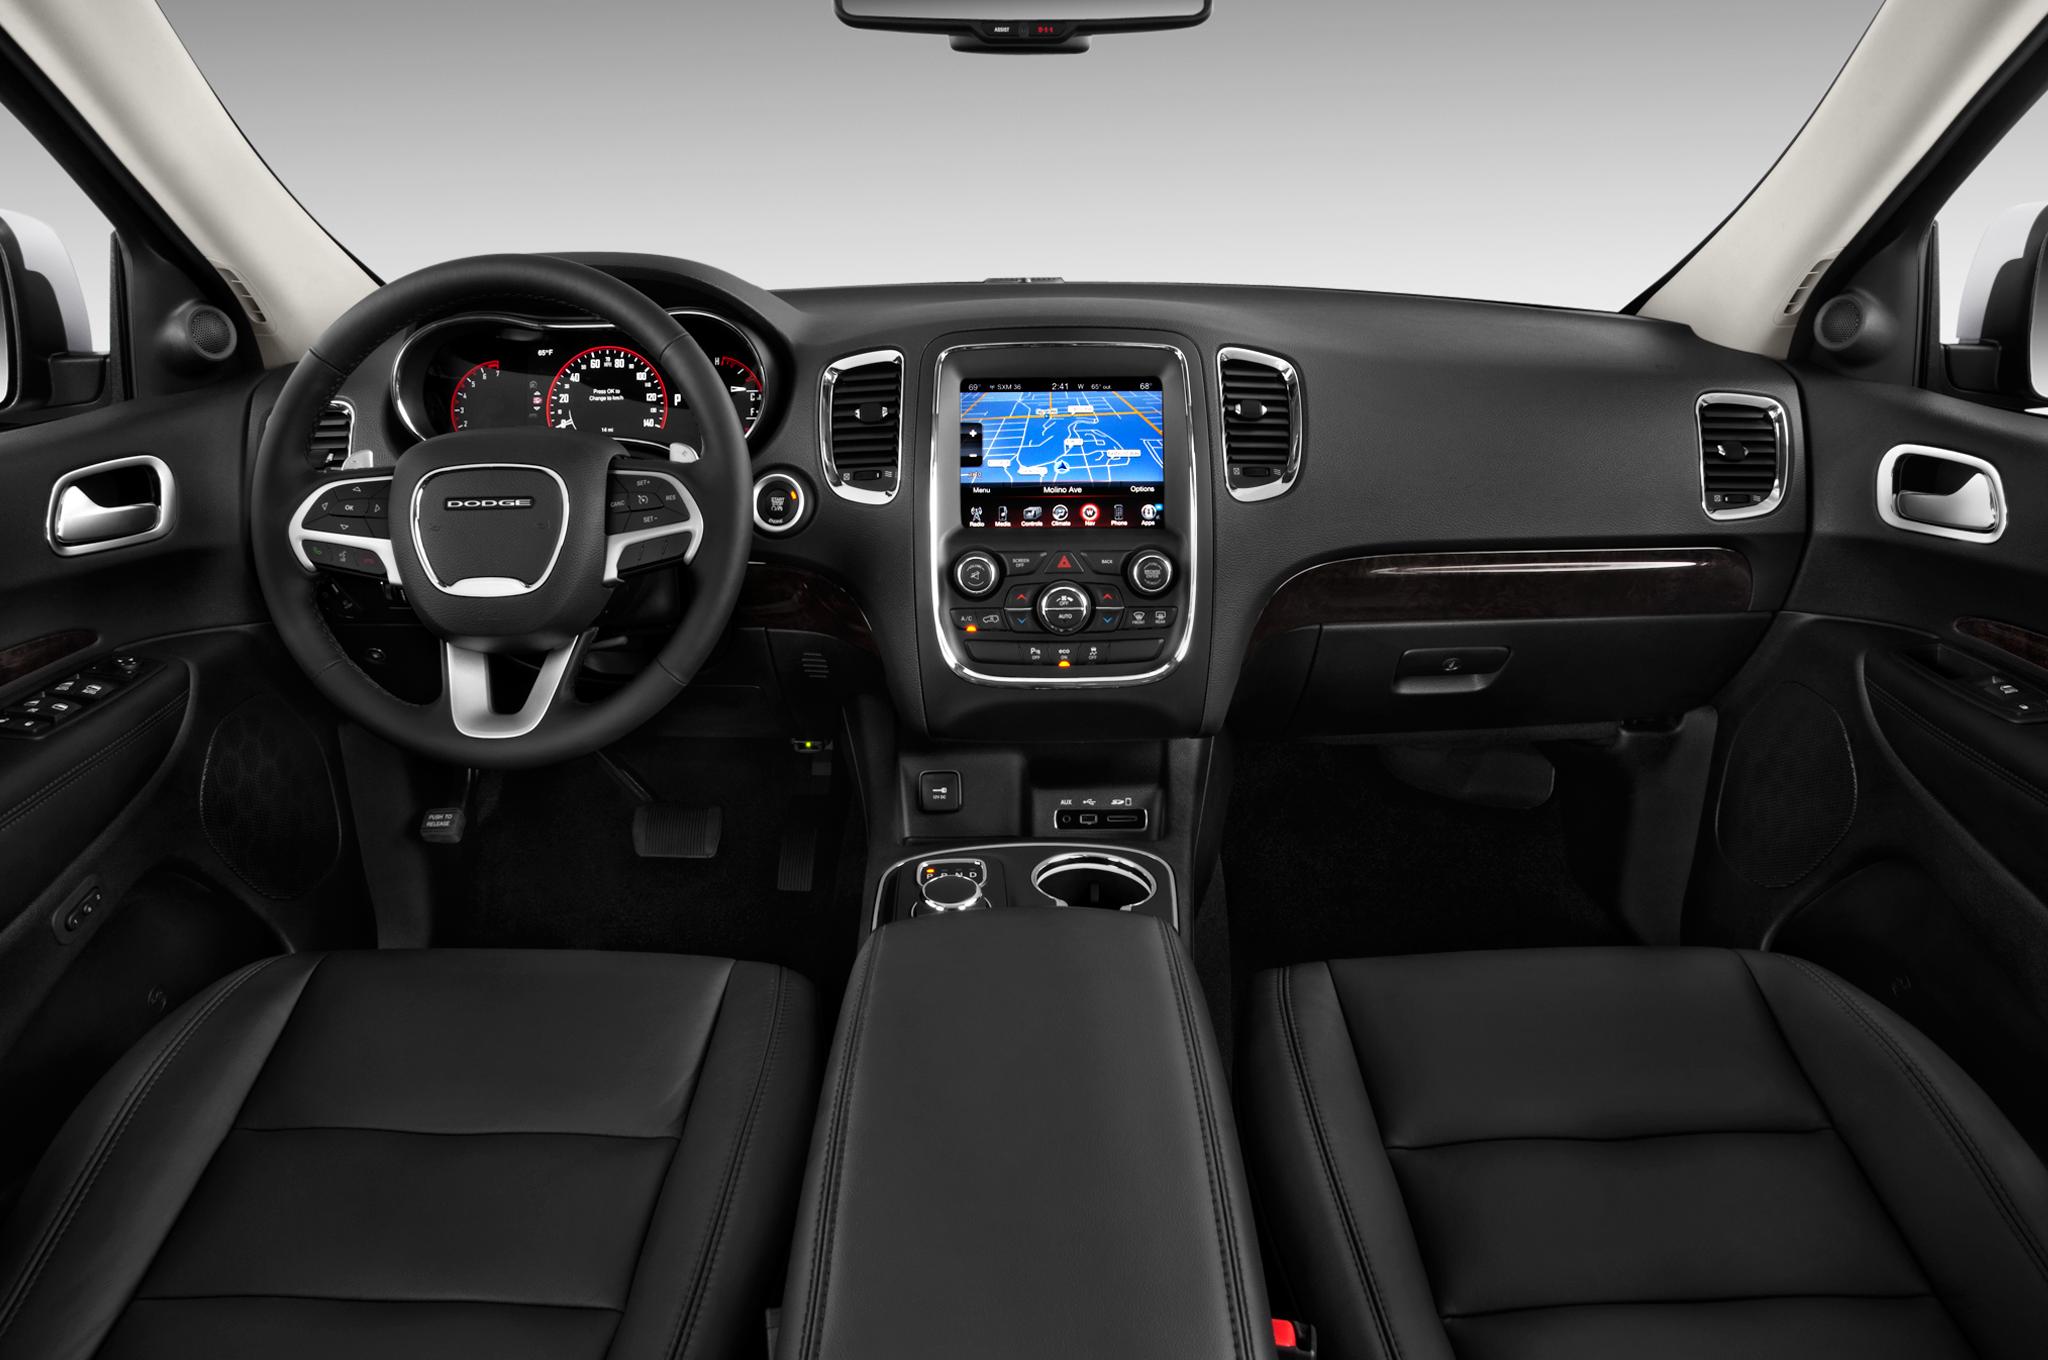 cockpit utility interior com photos dodge photo automotive sport sxt durango